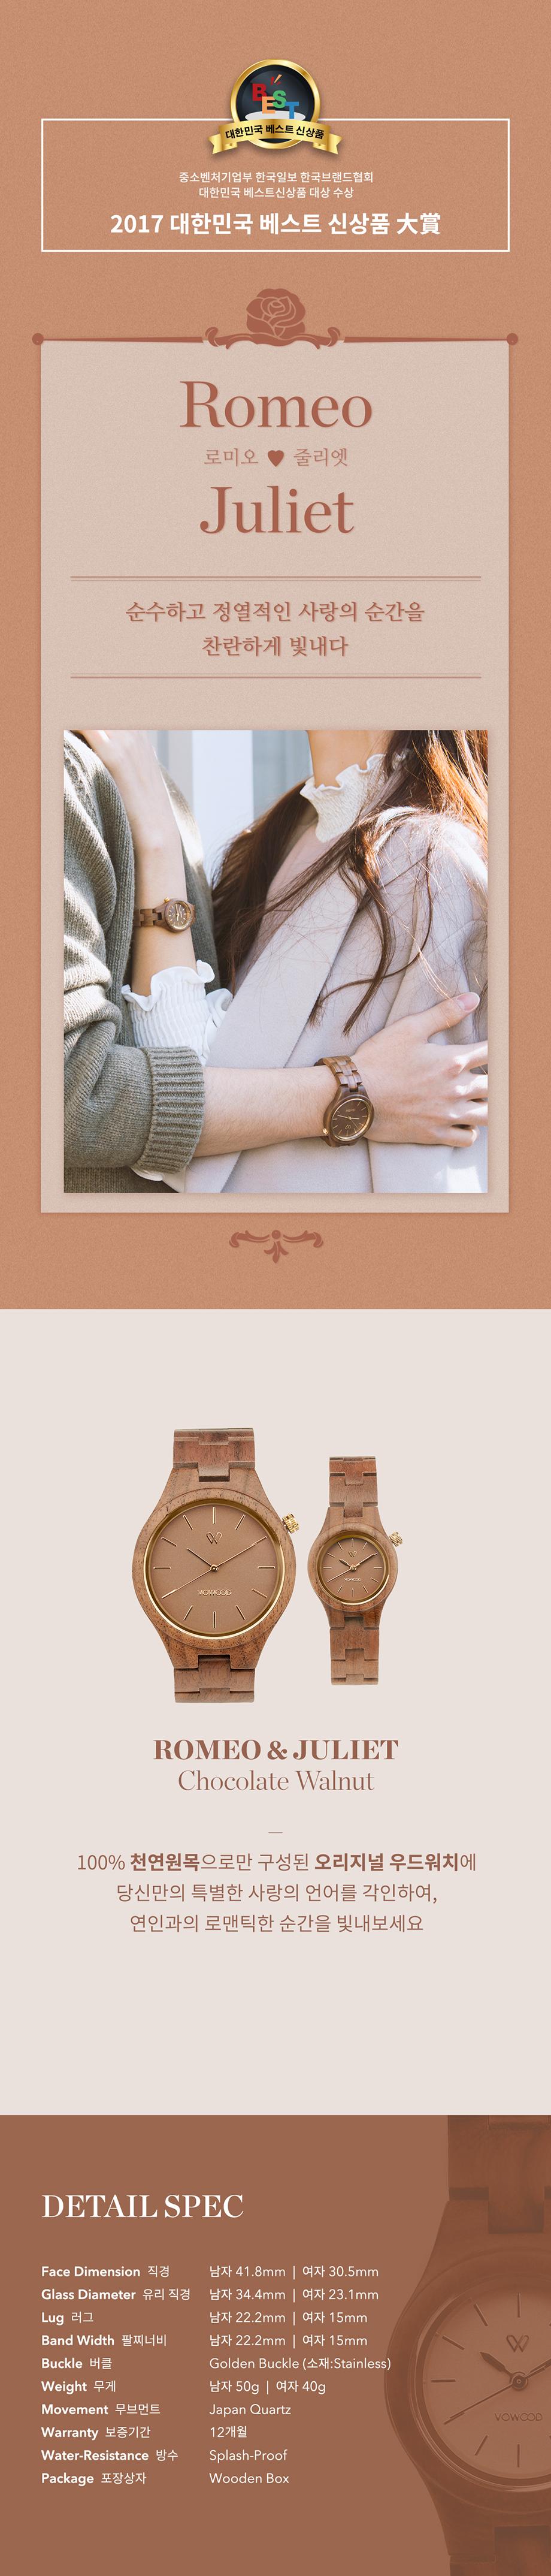 Romeo Juliet - Chocolate Walnut - 바우드, 348,000원, 시계세트, 커플시계